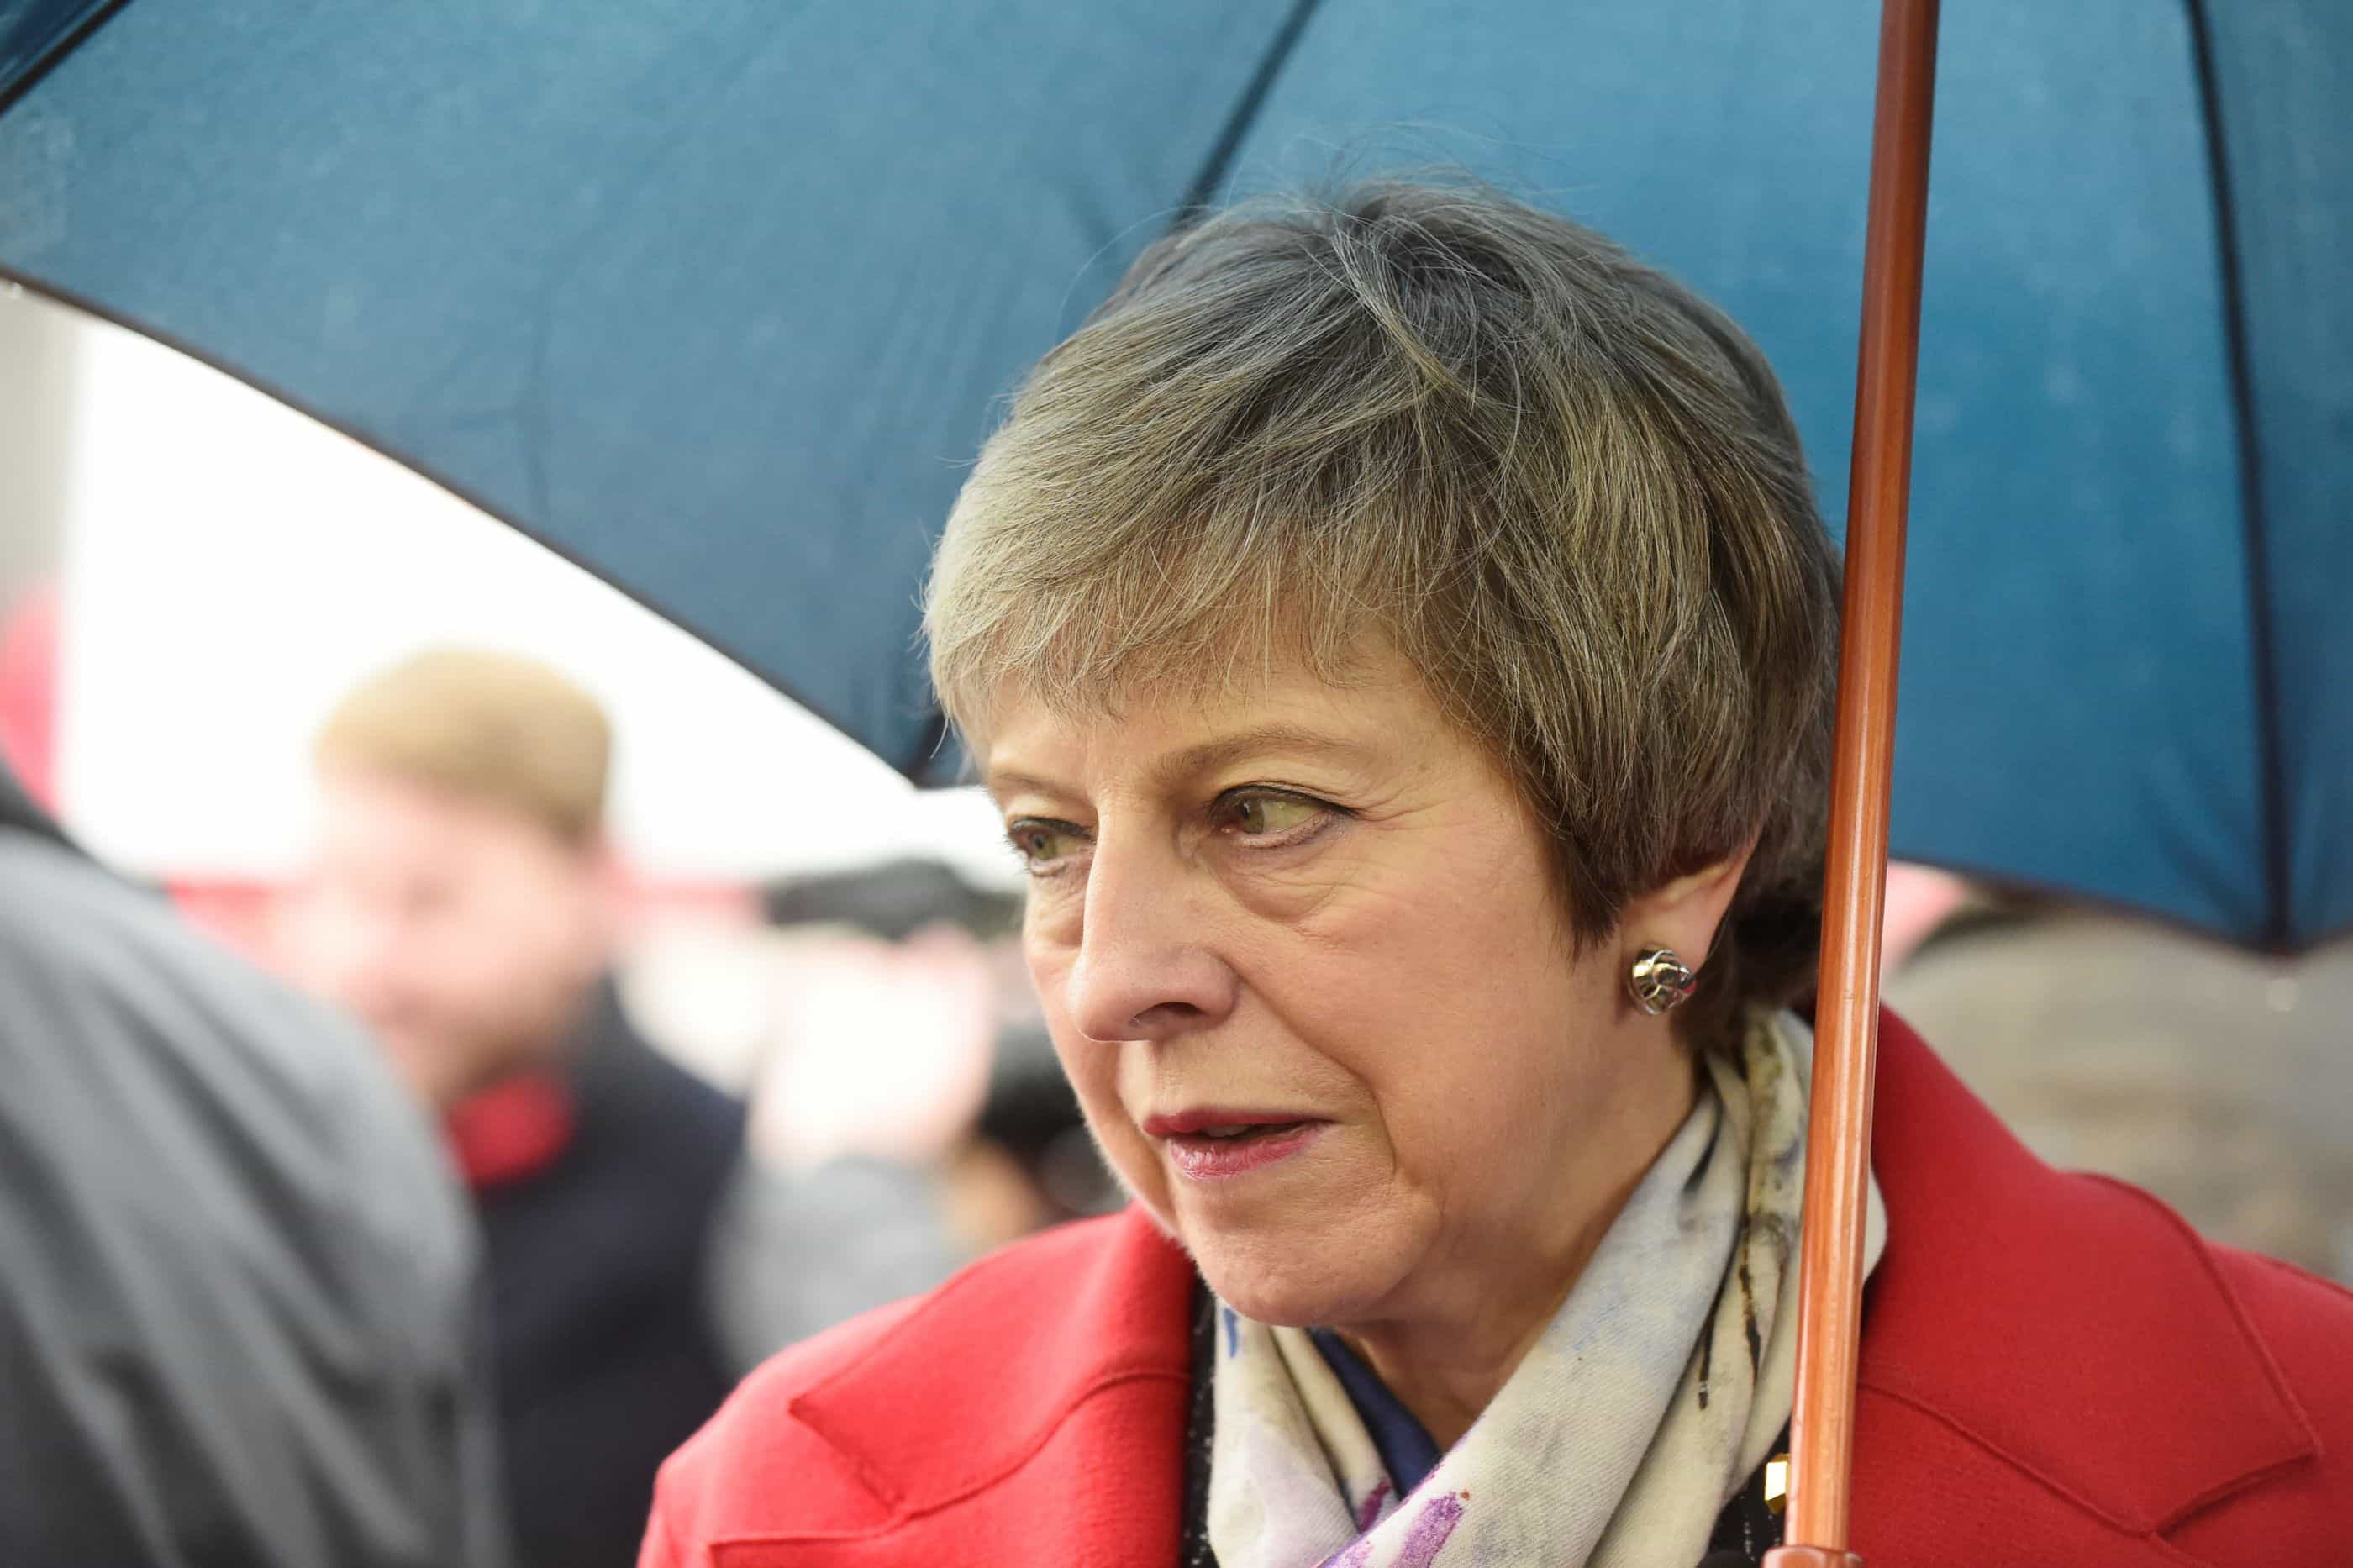 May inicia contactos com líderes europeus para obter garantias adicionais